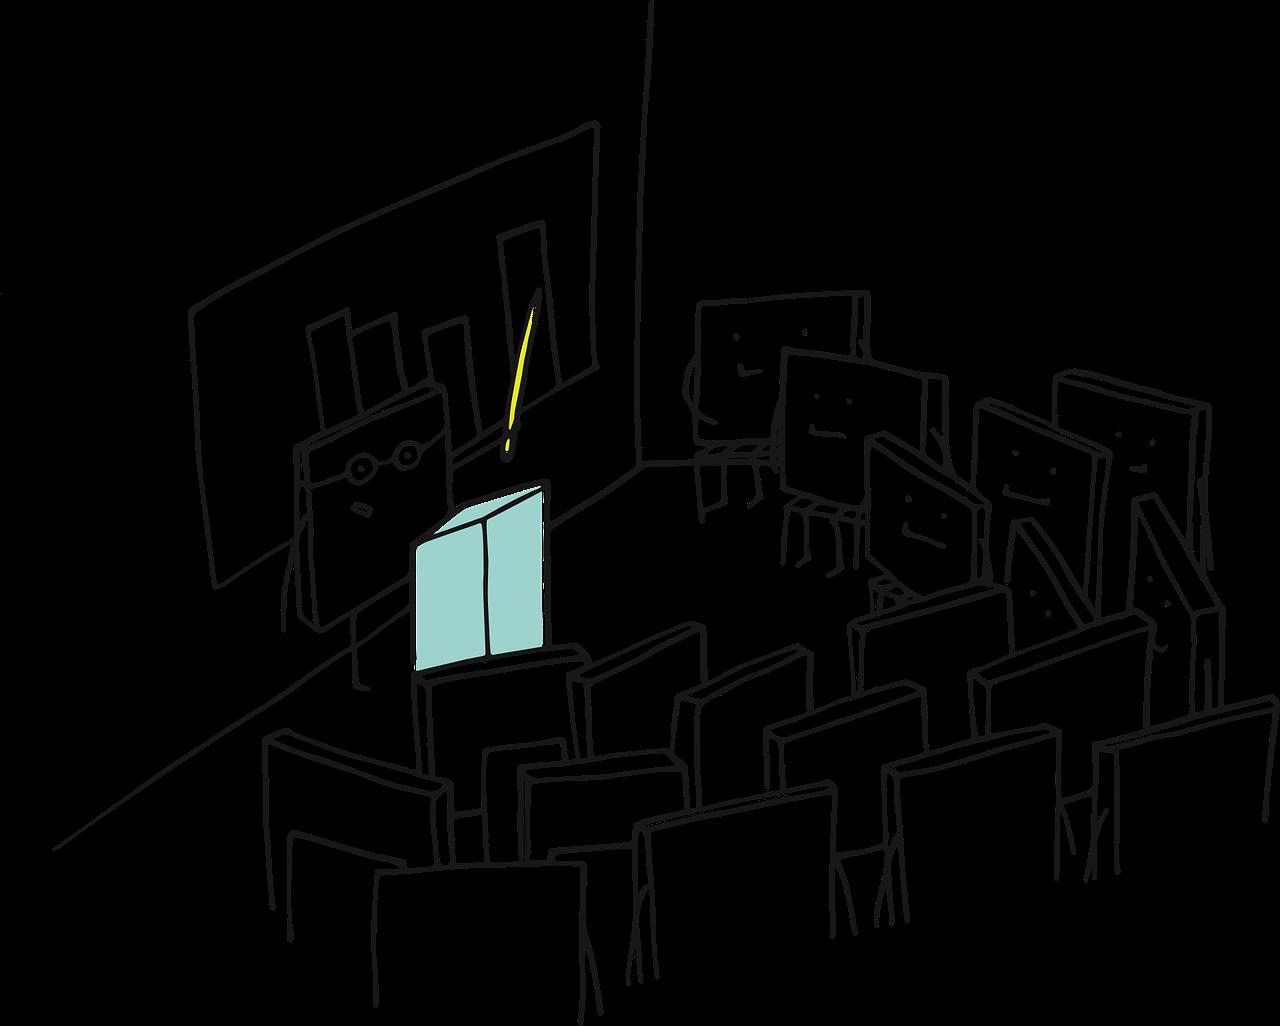 pixel-cells-3976296_1280